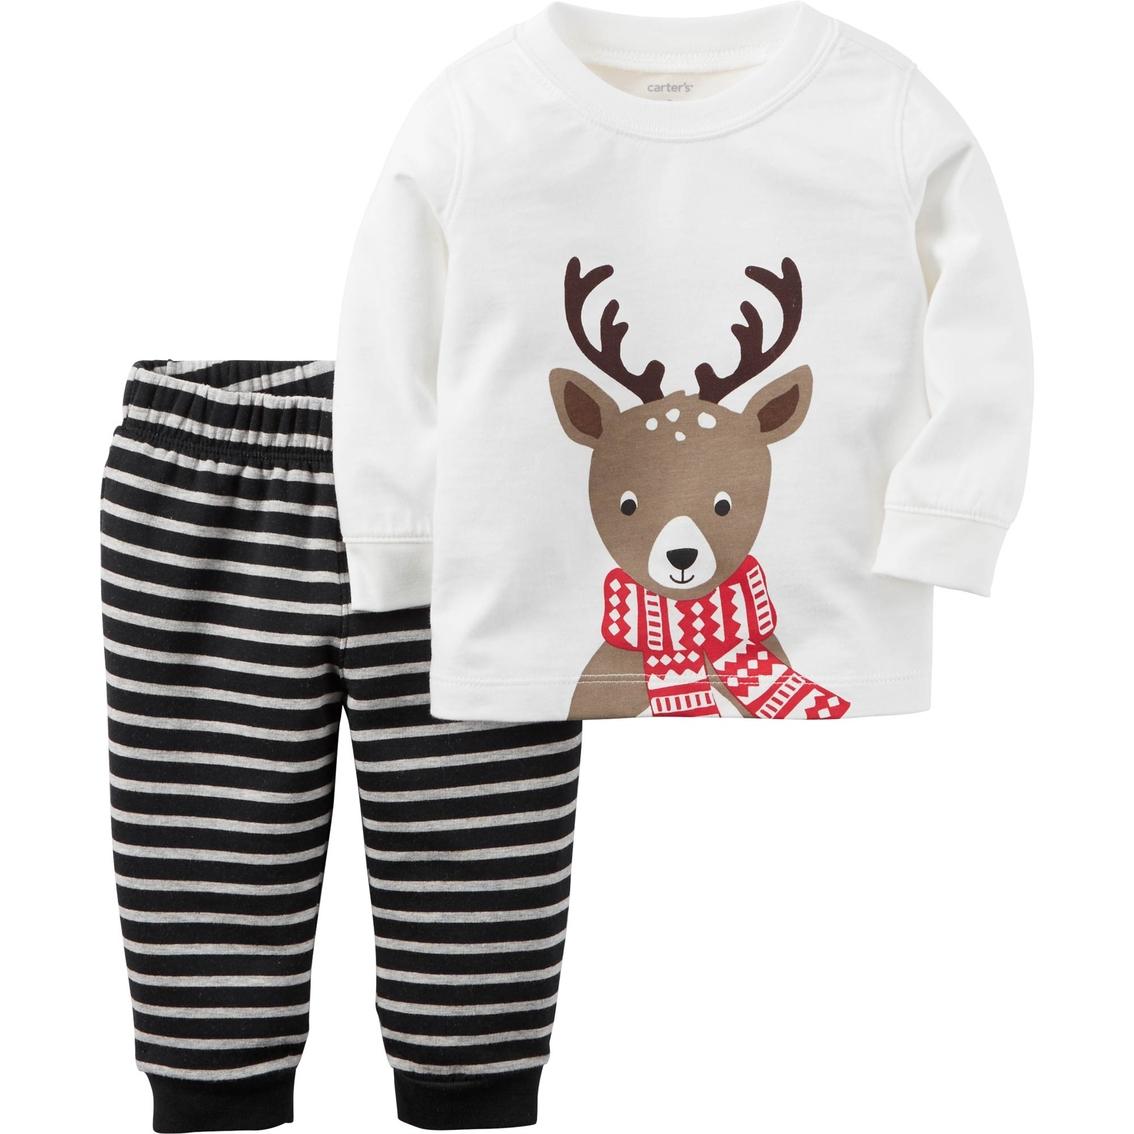 Carter\'s Infant Boys 2 Pc. Reindeer Set   Baby Boy 0-24 Months ...